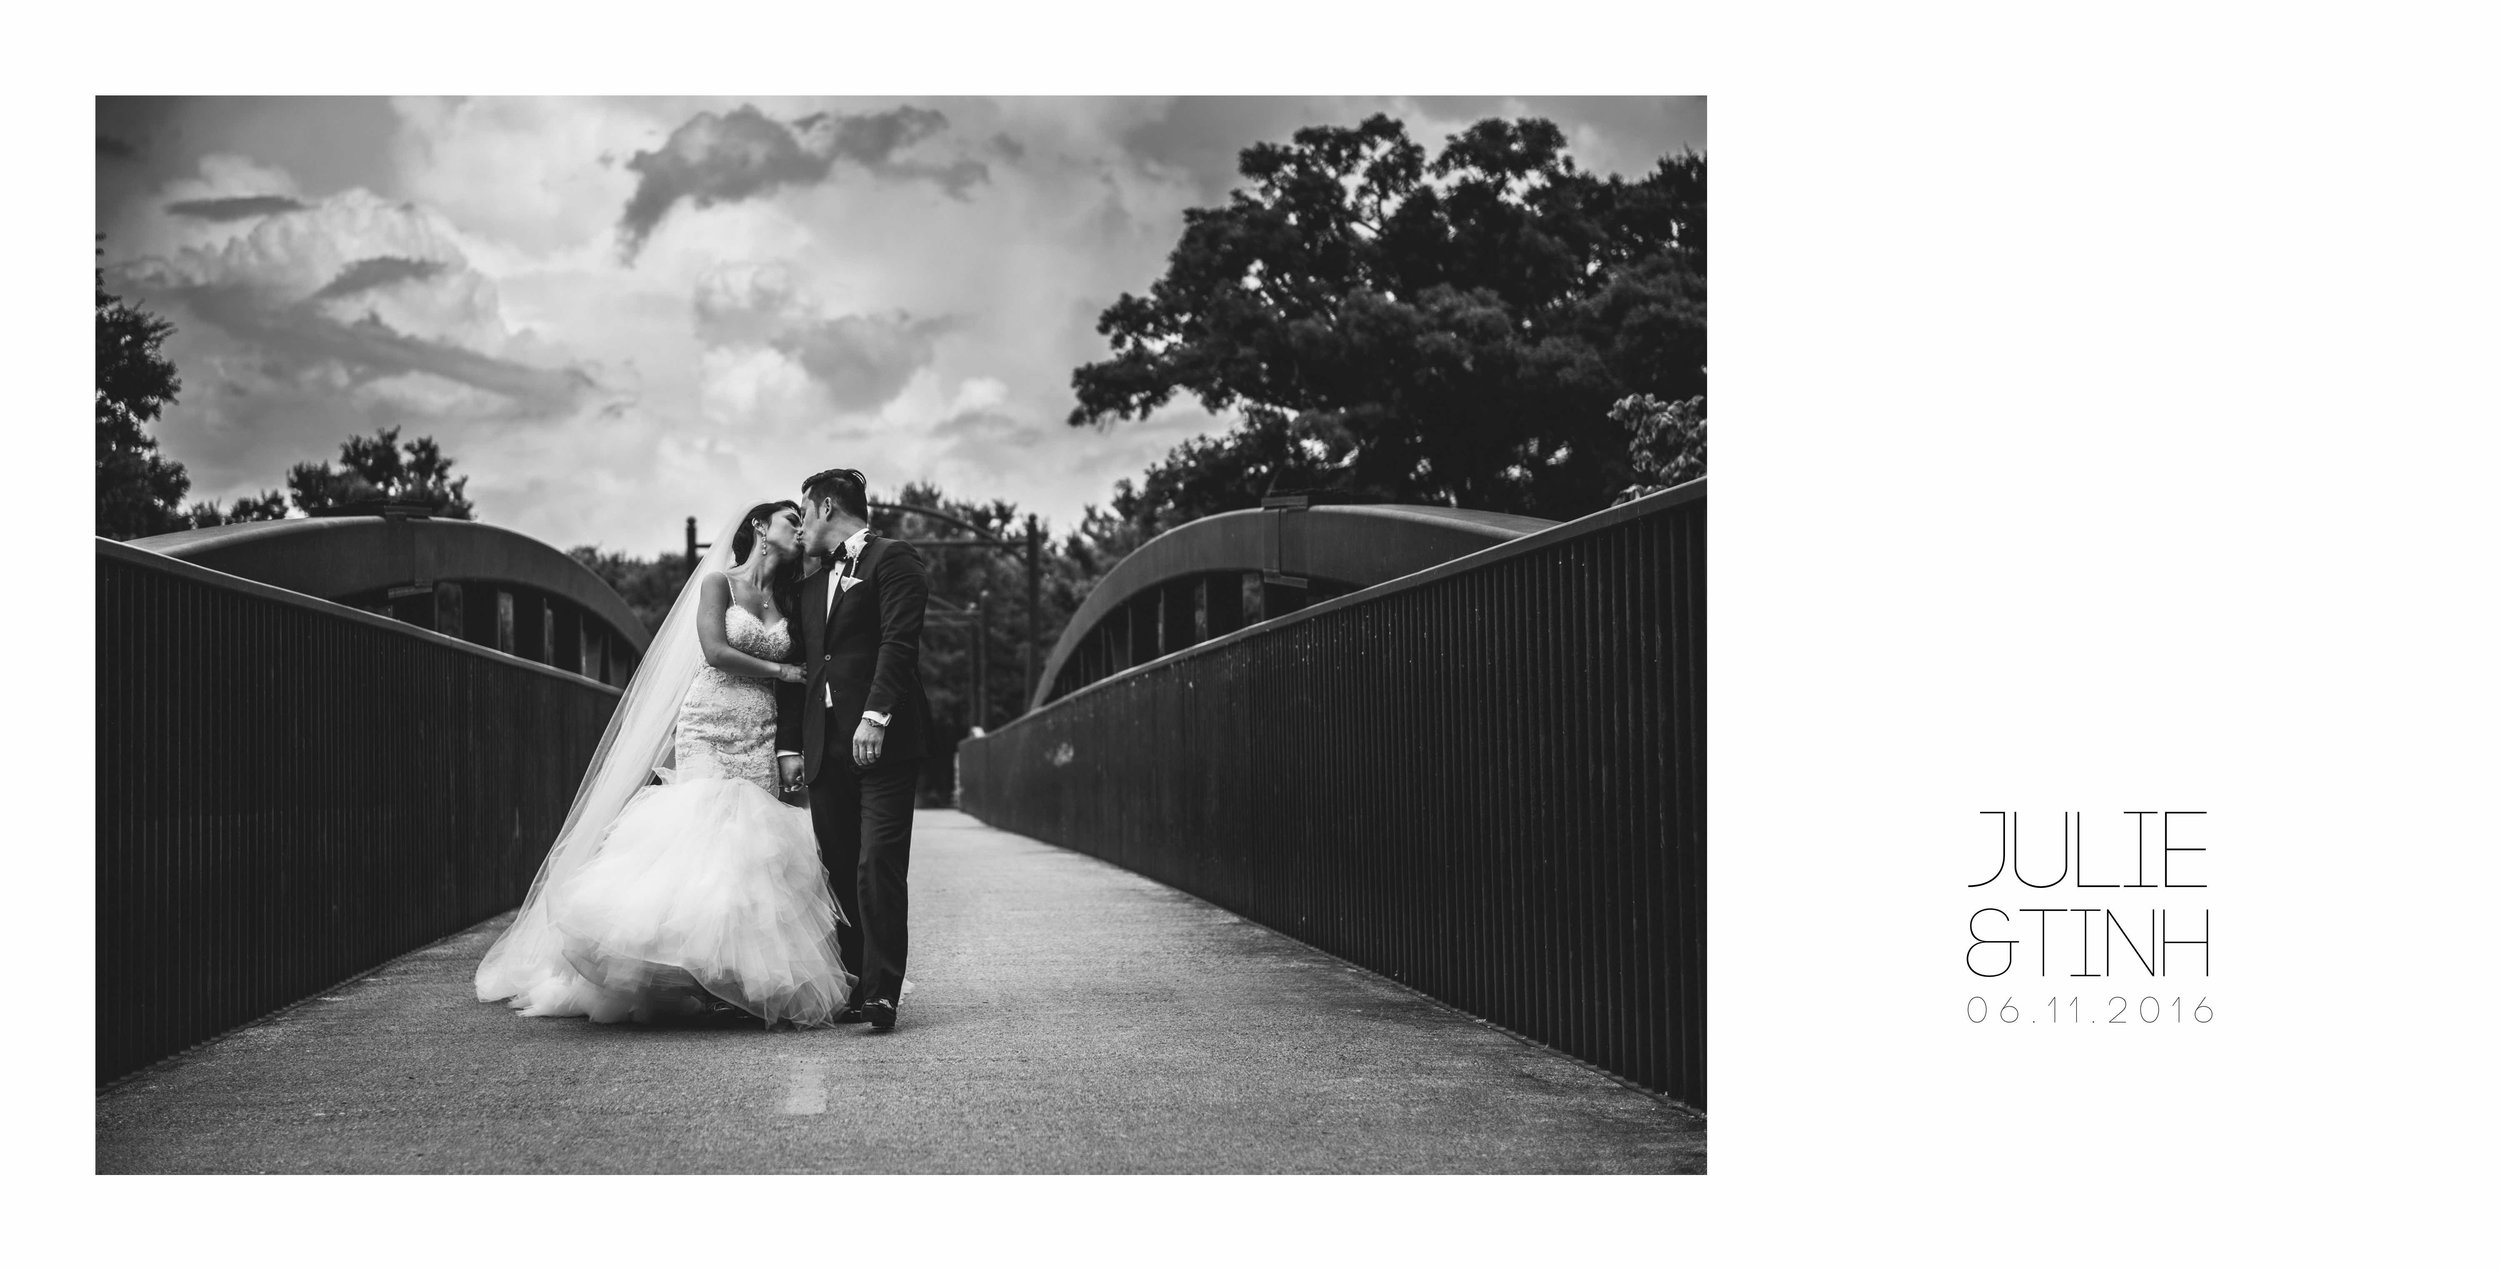 Julie+Tinh_|_Wedding__01.jpg